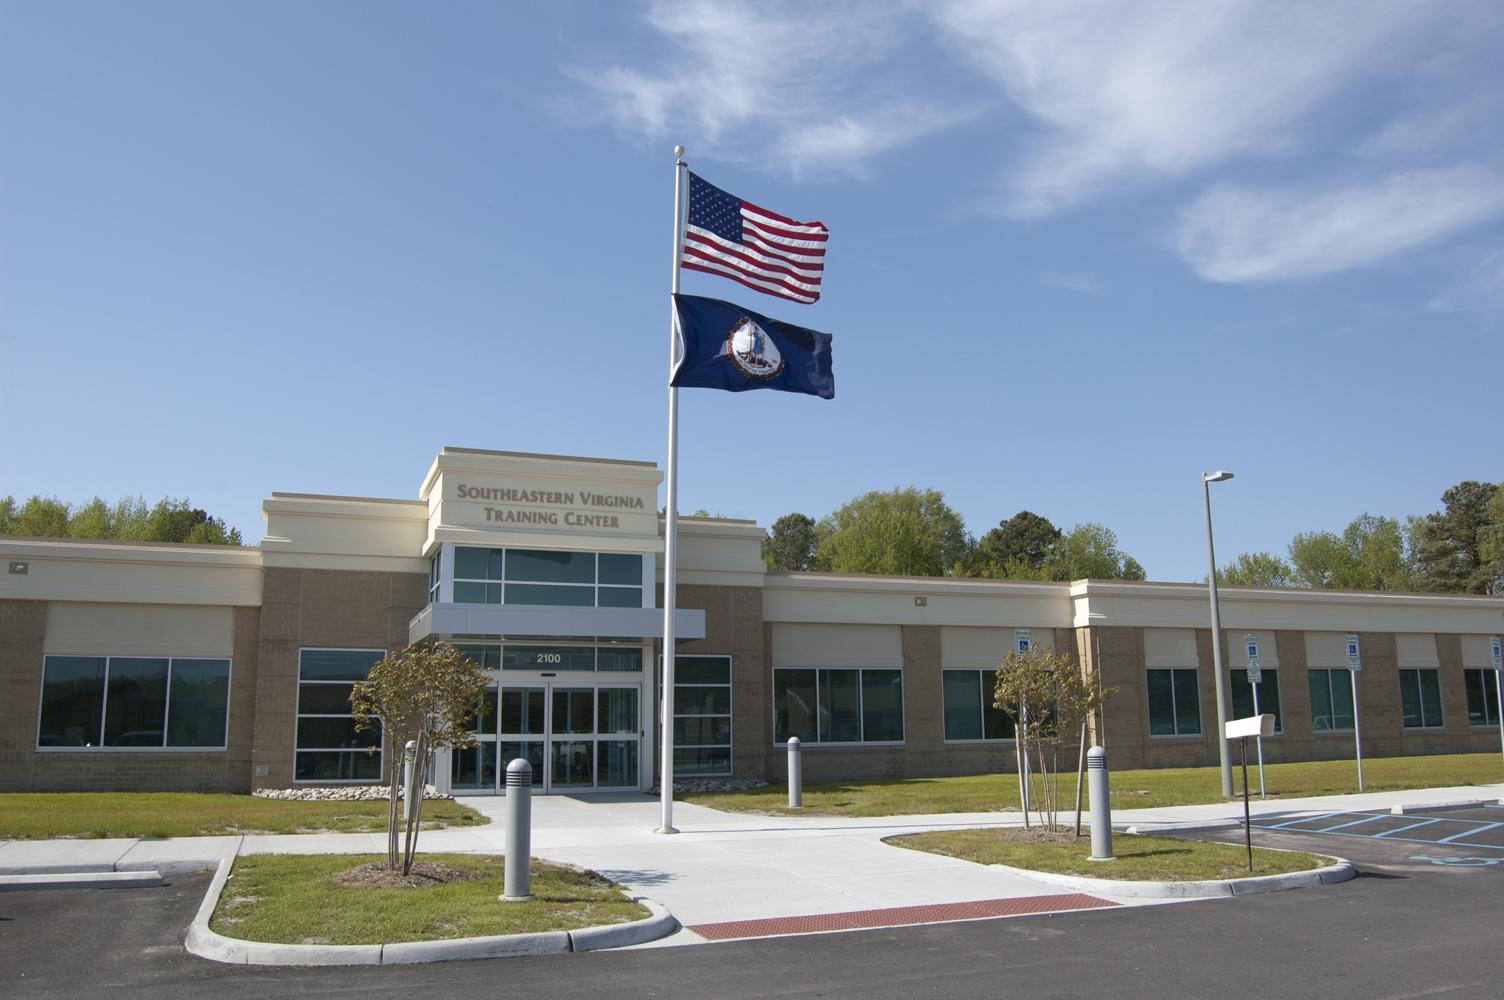 Southeastern Virginia Training Center